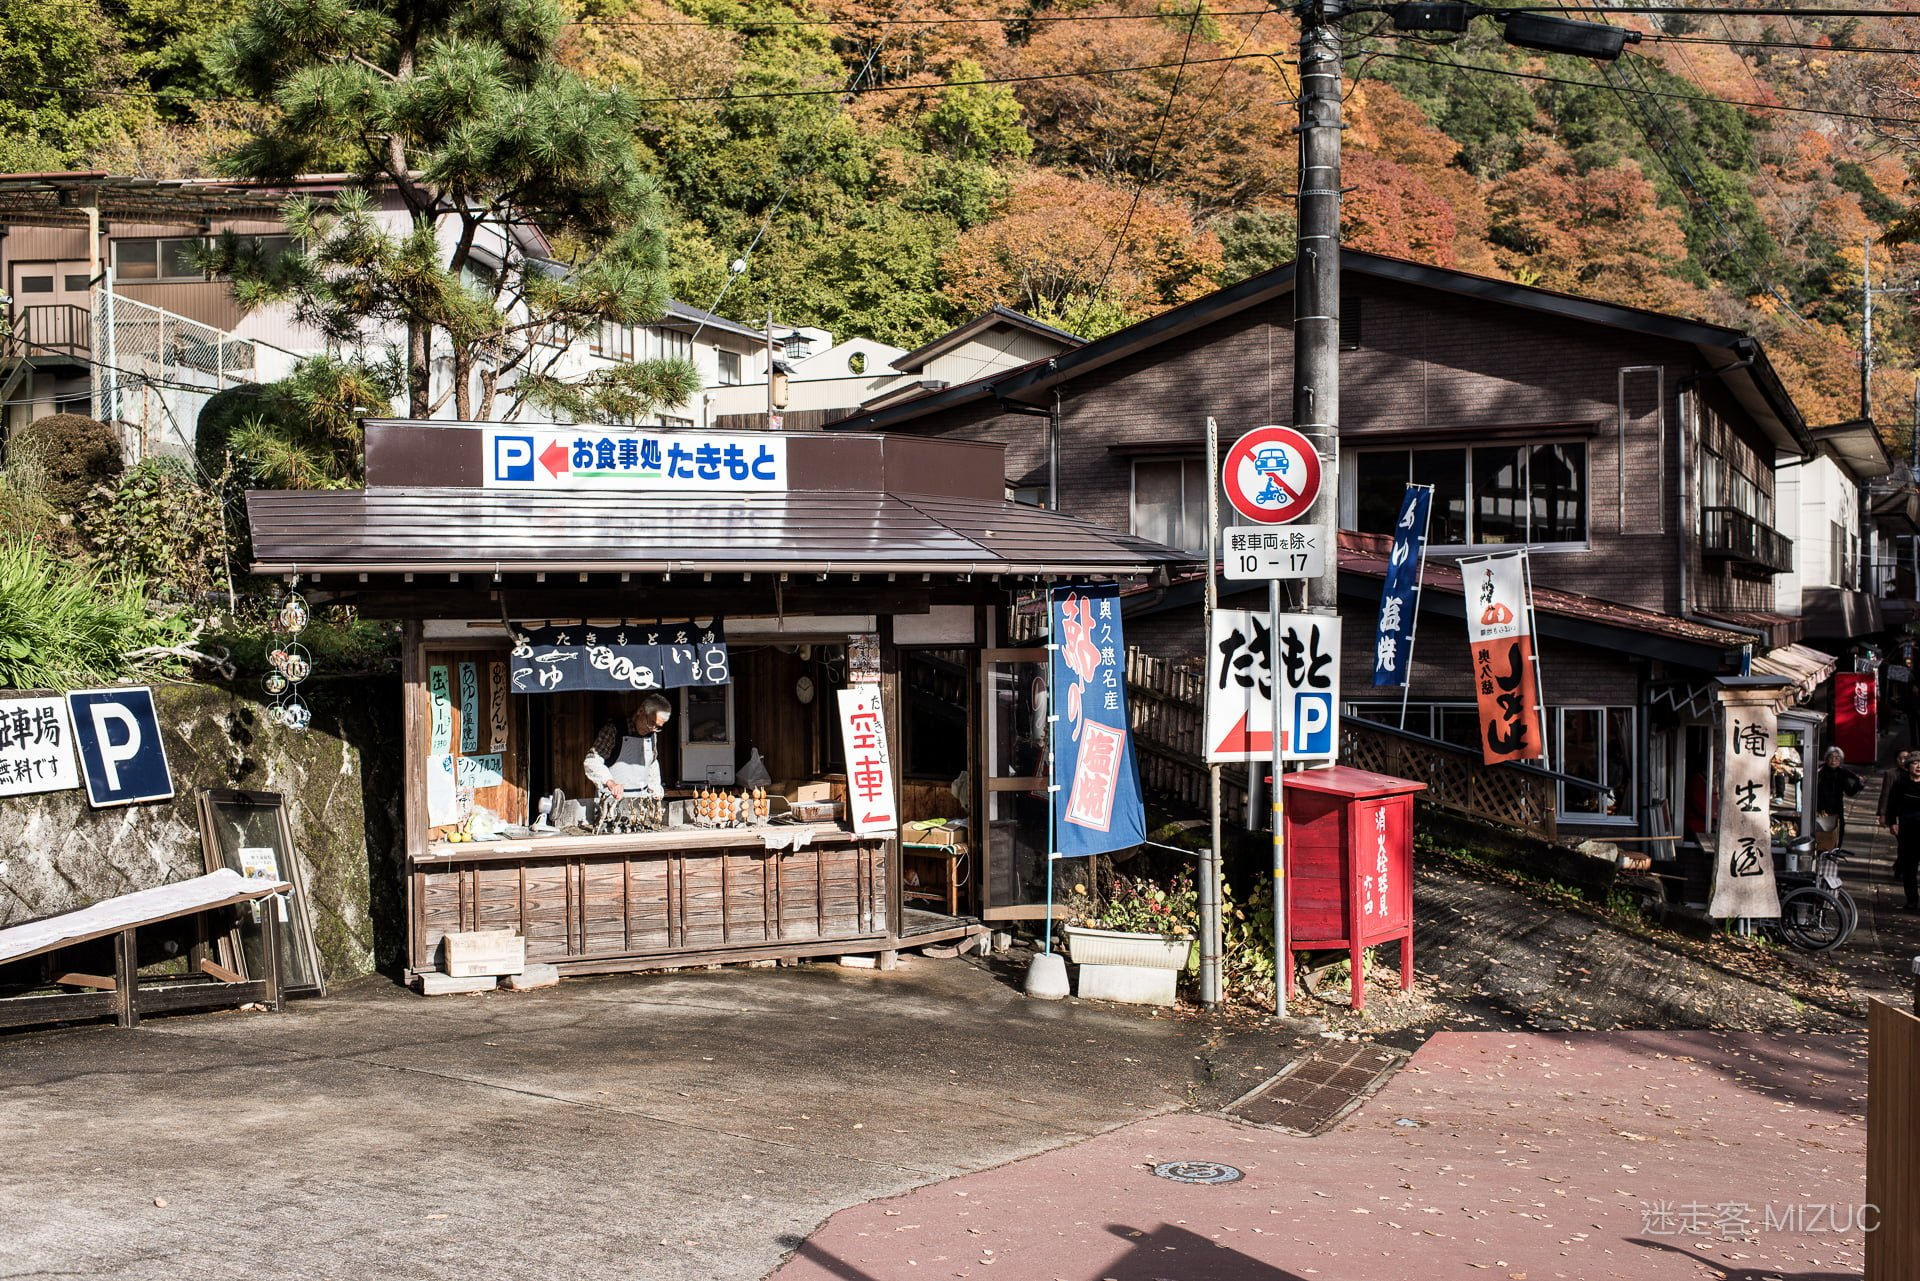 201711 Ibaraki Tochigi Gunma Japan Travel By RentalCar 31 日本自駕旅遊/北關東三縣「茨城、櫪木、群馬」秋天美食、溫泉與瀑布秘境百景(精選照片分享)